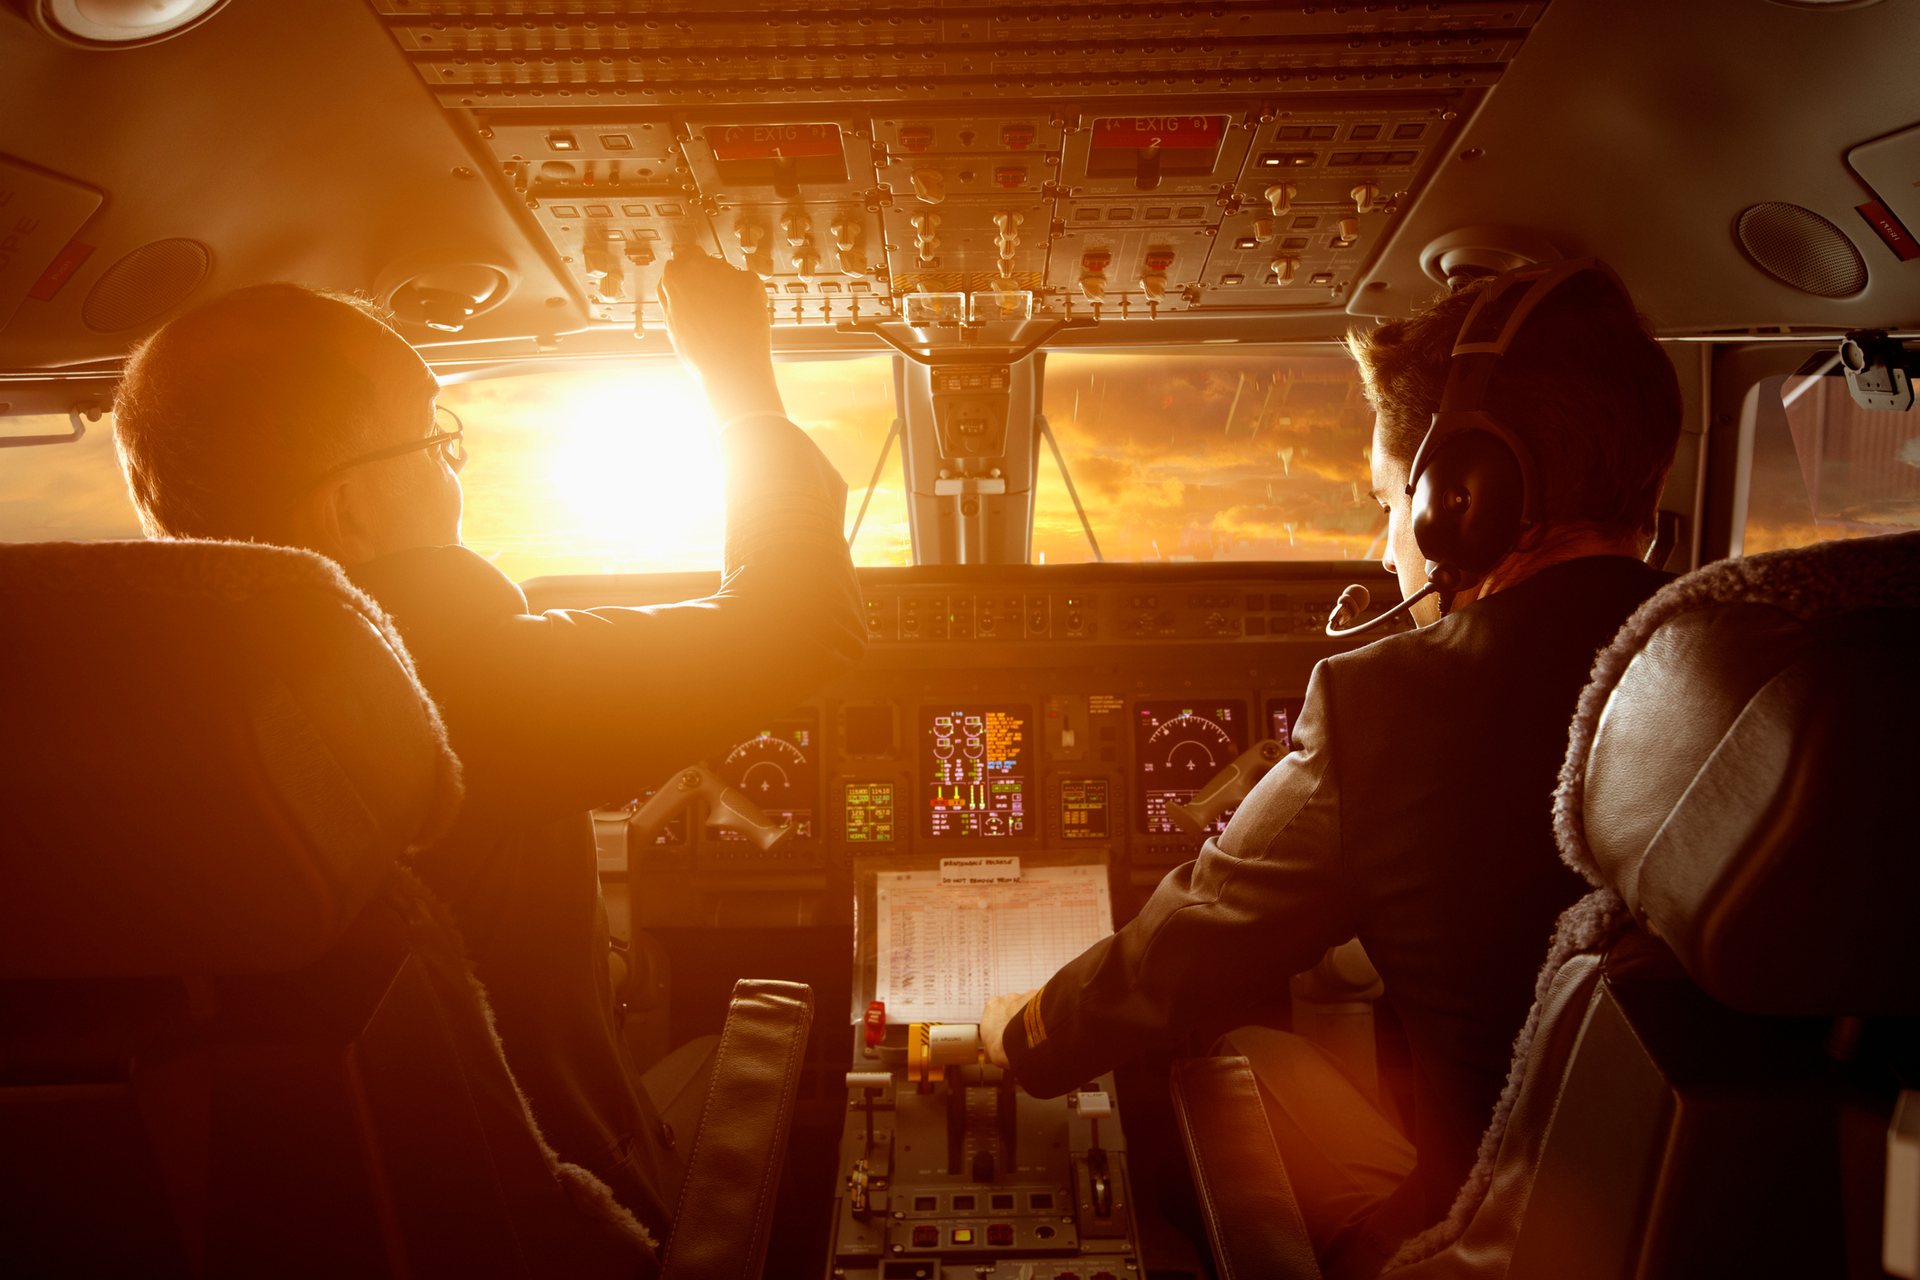 Flight deck secrets: Pilot reveals secret codes used between crew